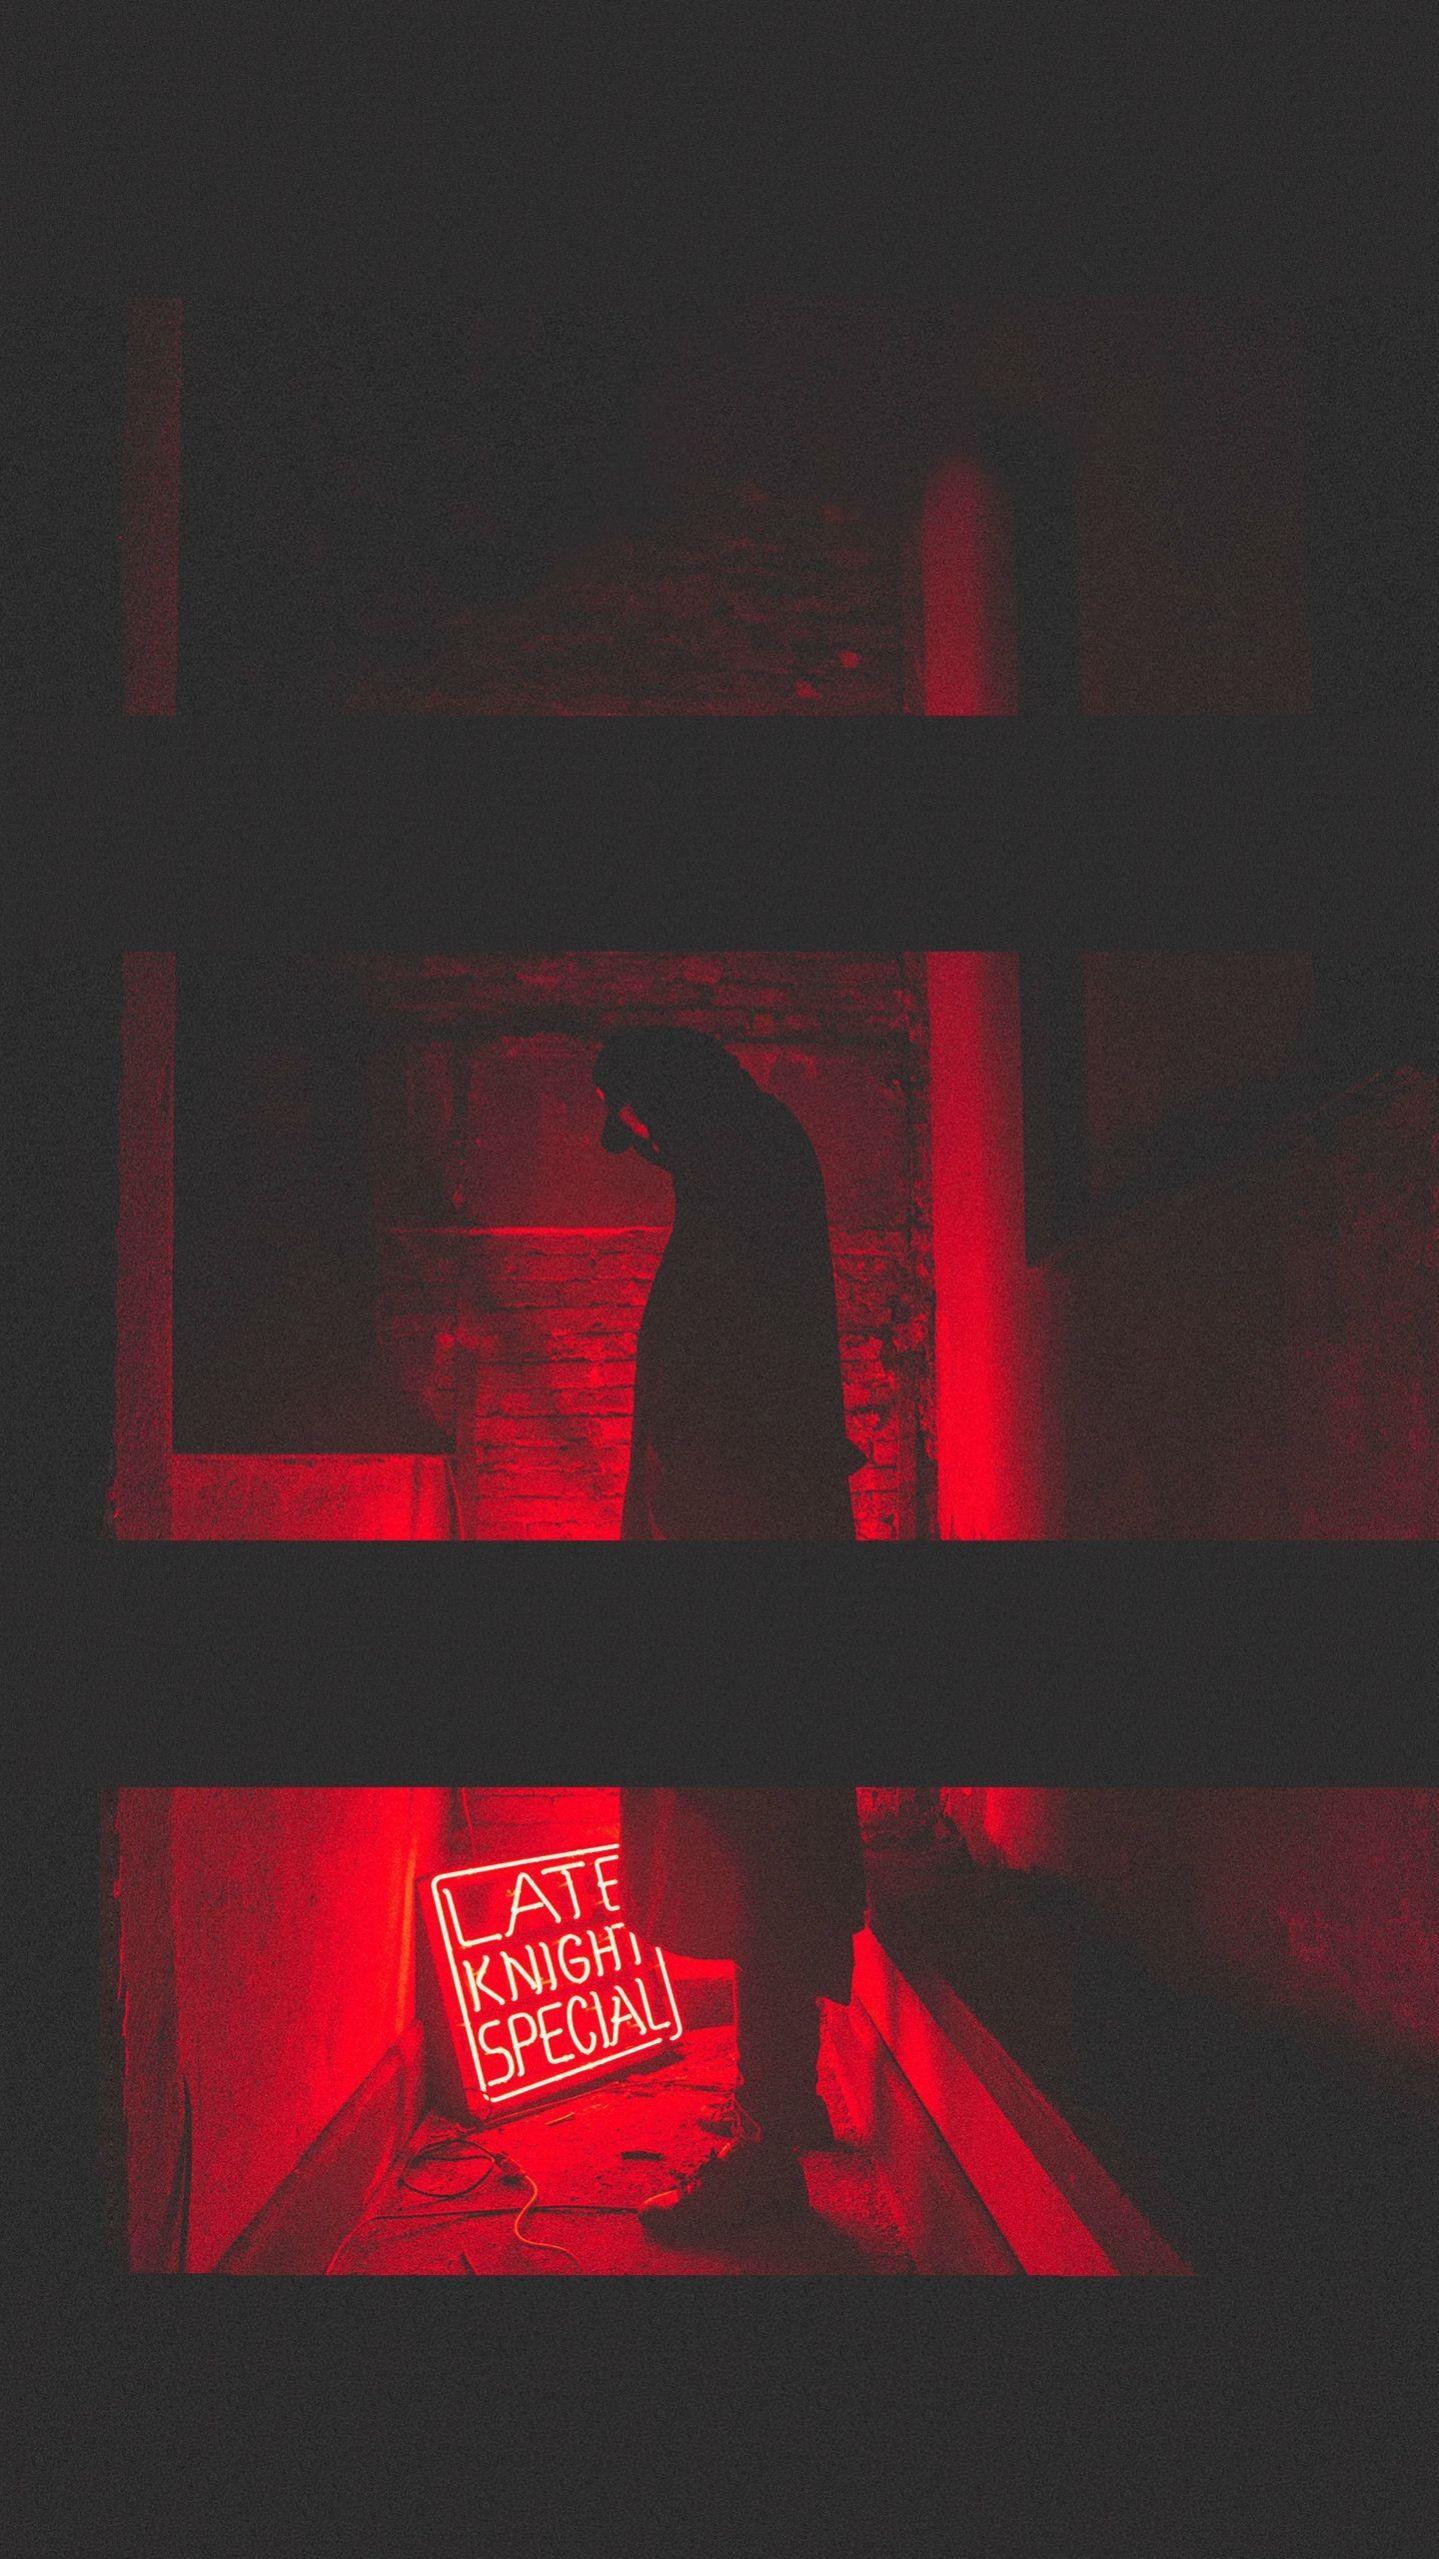 Unique Phone Wallpapers Reddit Neon aesthetic